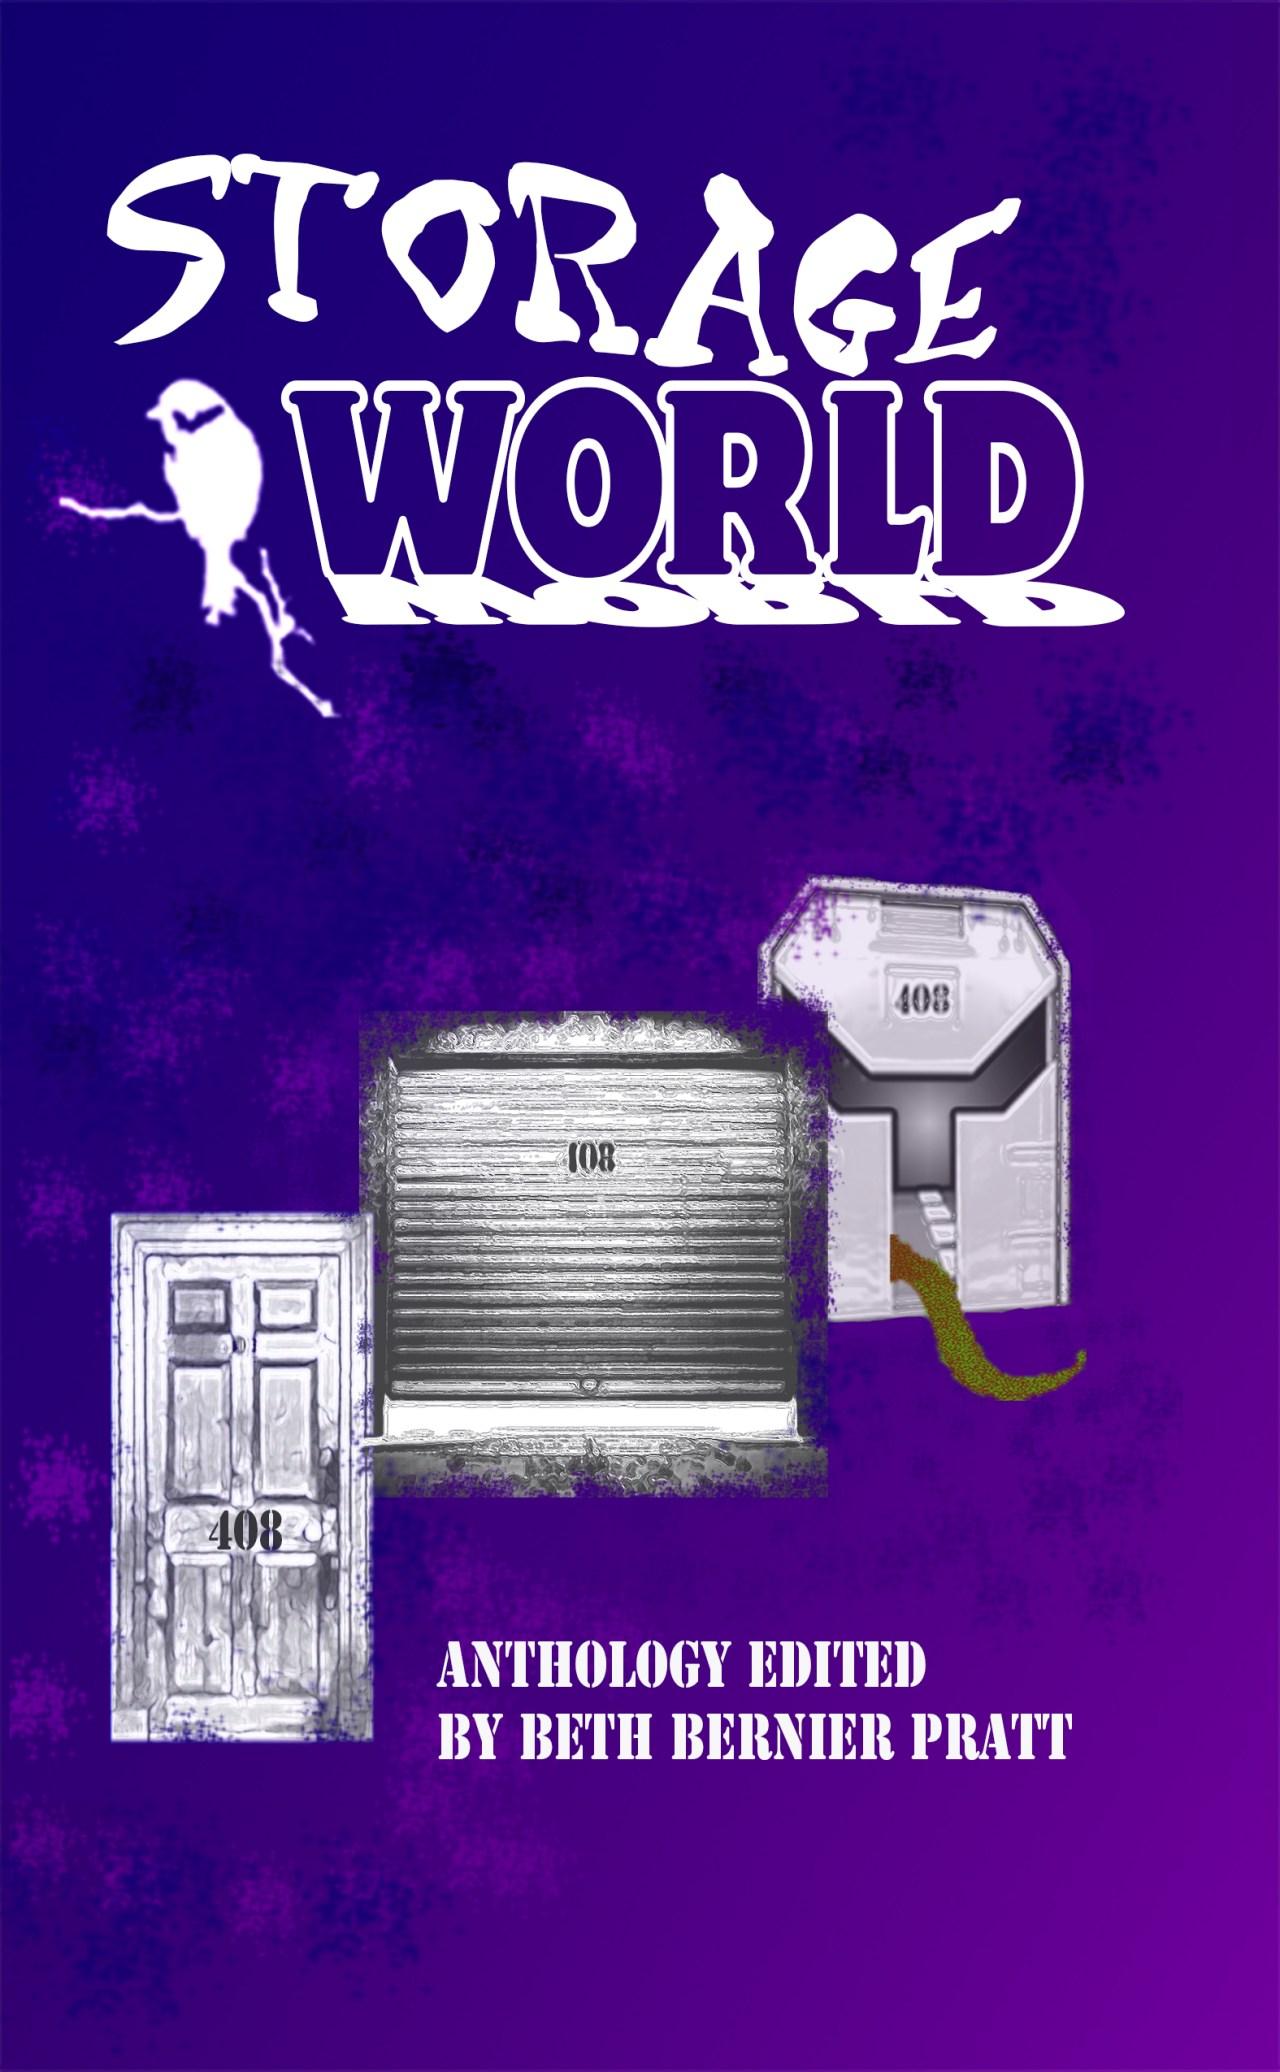 storage world cover 5